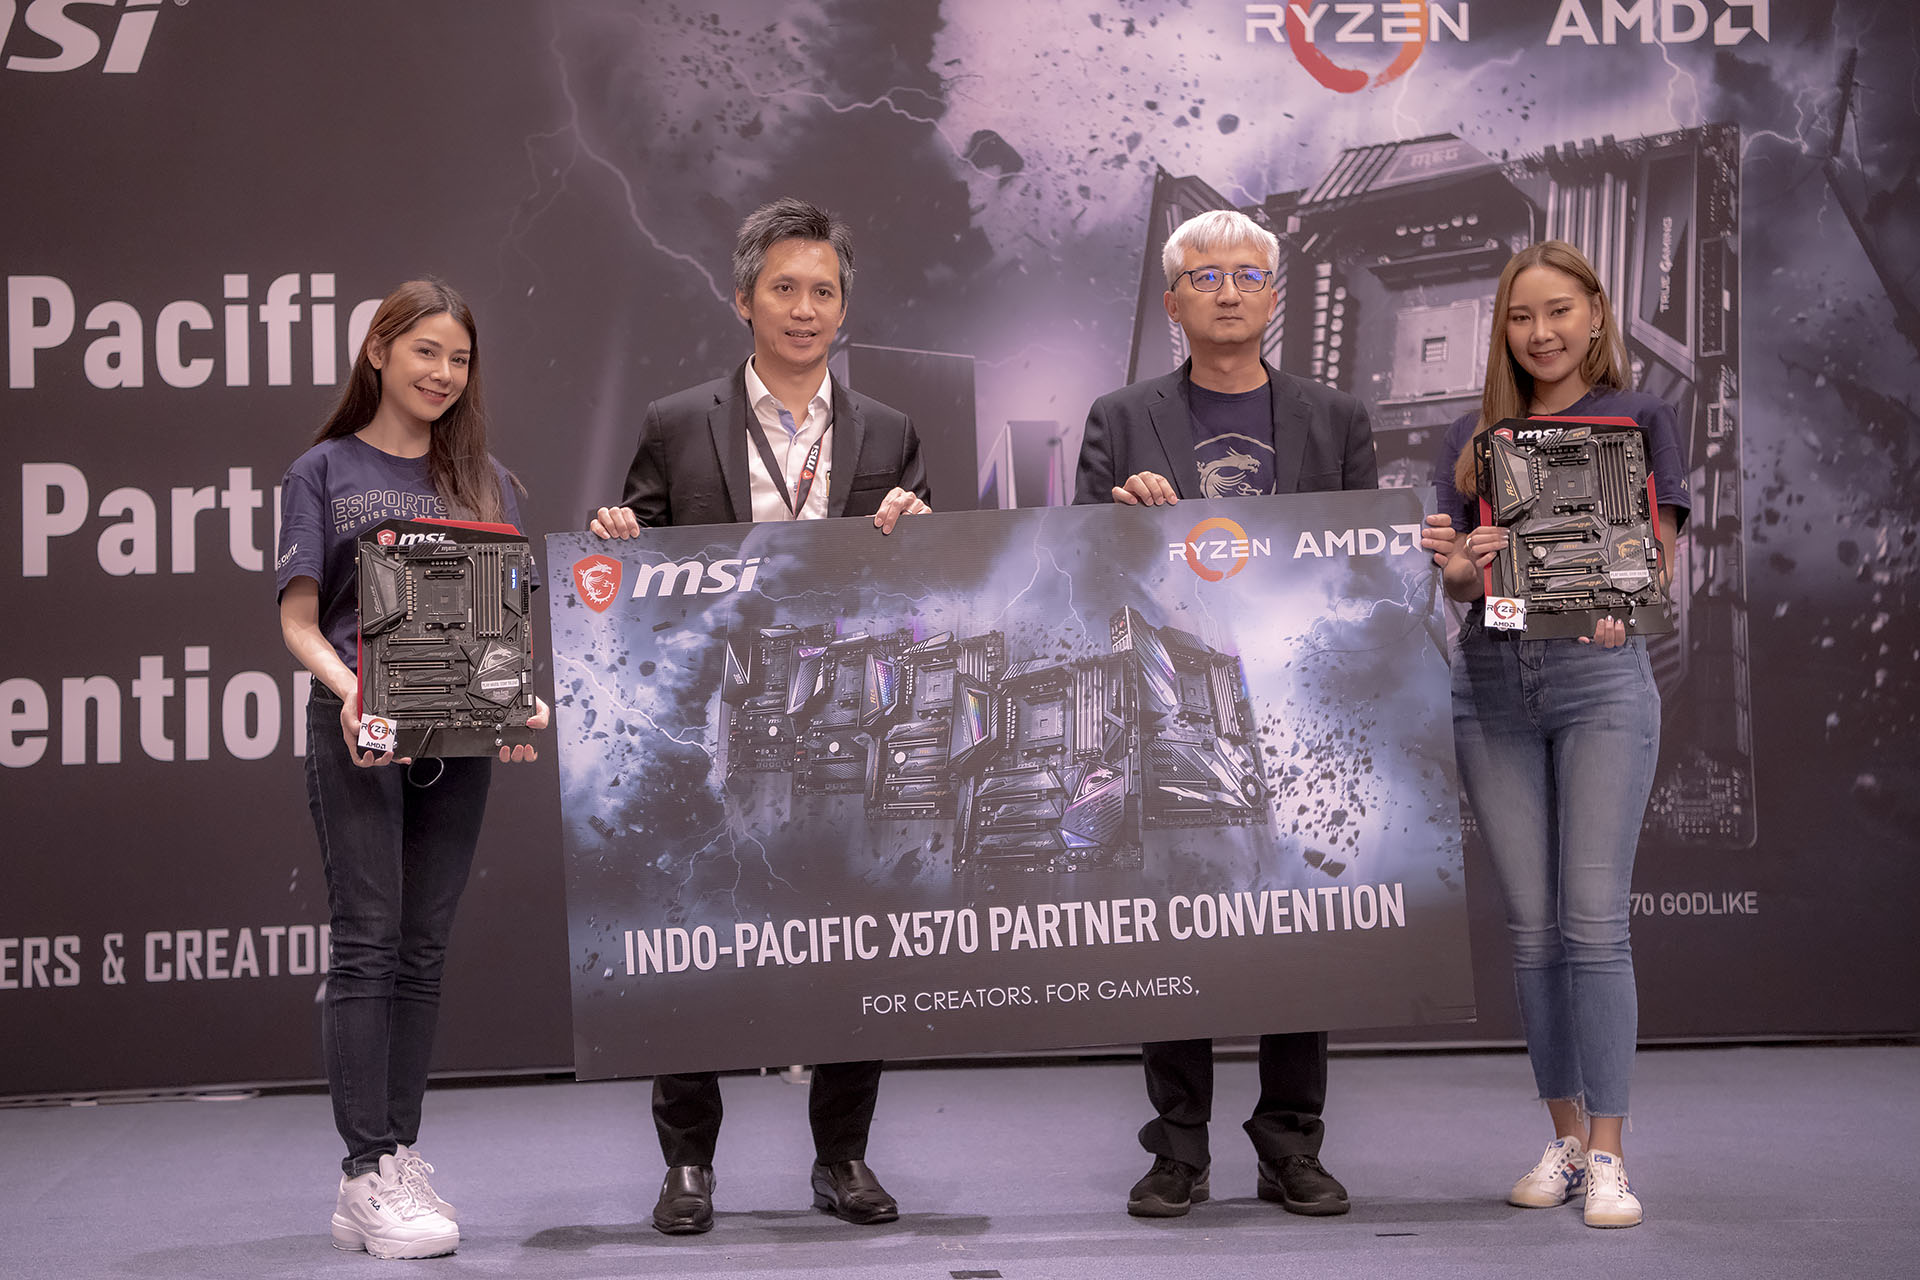 dsc 4899 บรรยากาศงาน MSI Indo Pacific X570 Partner Convention พบการเปิดตัวเมนบอร์ด X570 รุ่นใหม่ล่าสุดจากทาง MSI ต้อนรับการมาของซีพียู AMD RYZEN 3000ซีรี่ย์